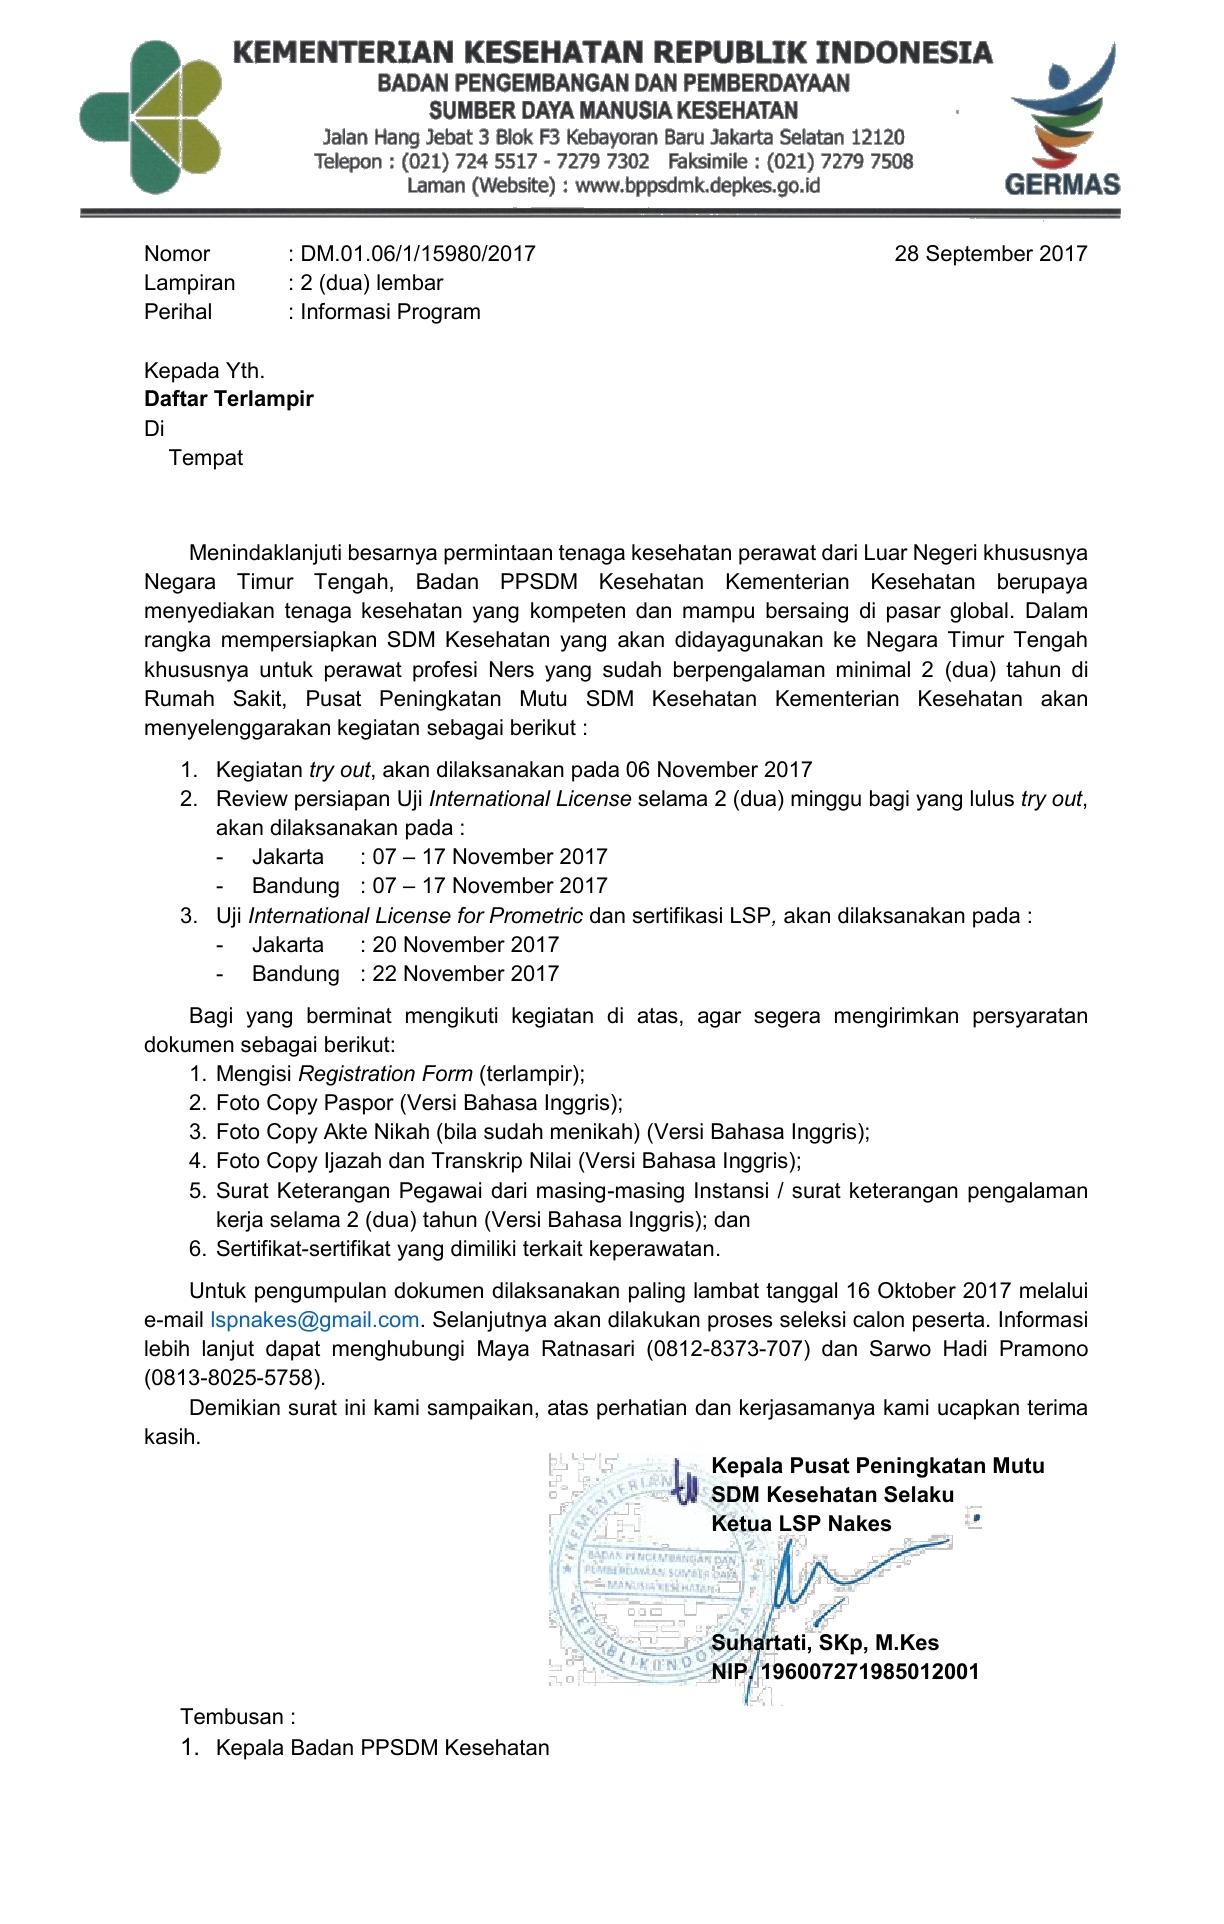 Surat Pemberitahuan Next Program LSP Nakes1